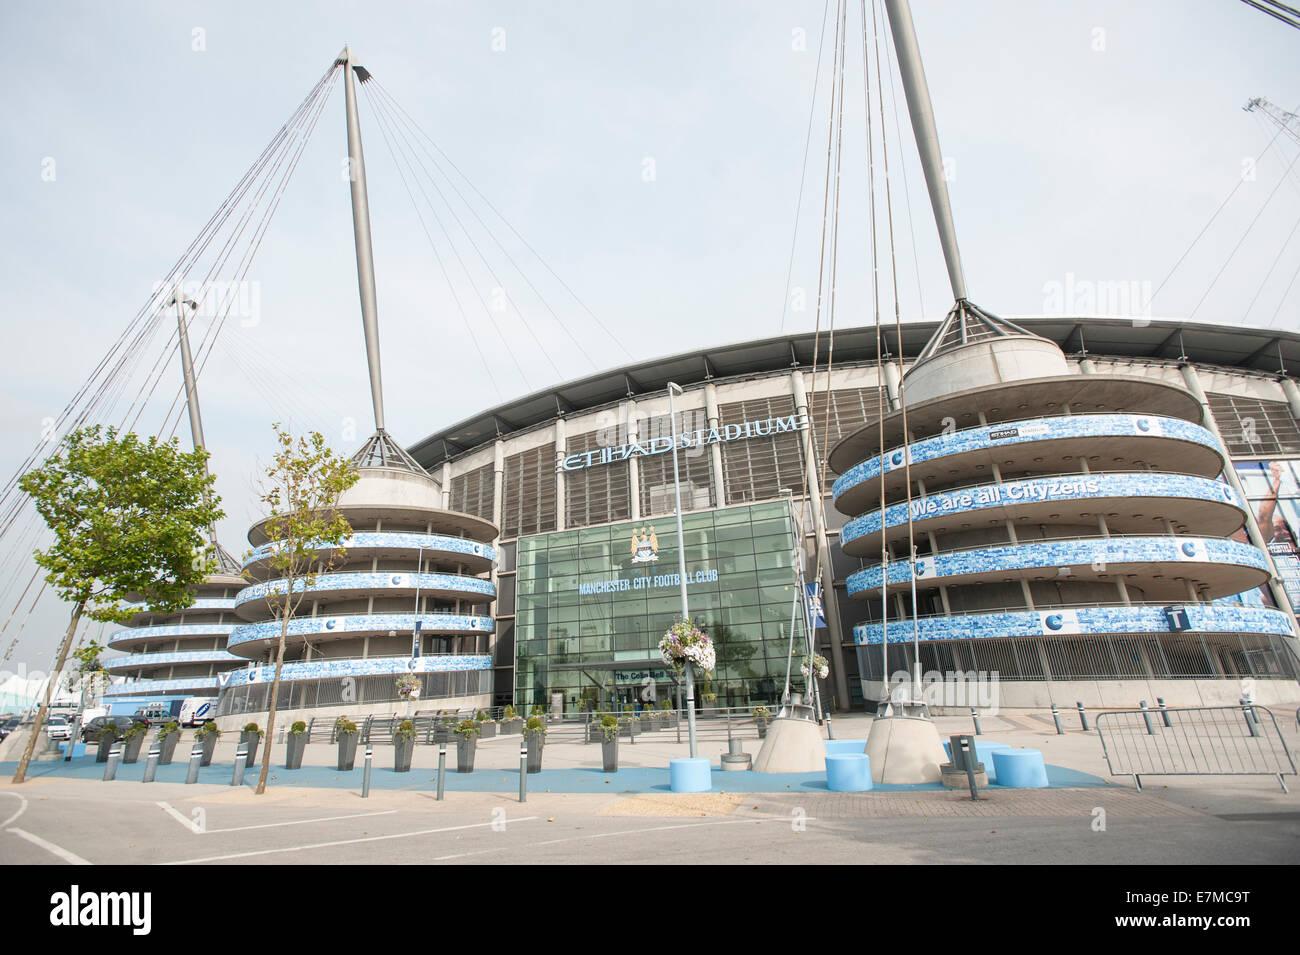 Manchester City F.C. Etihad Stadium. - Stock Image